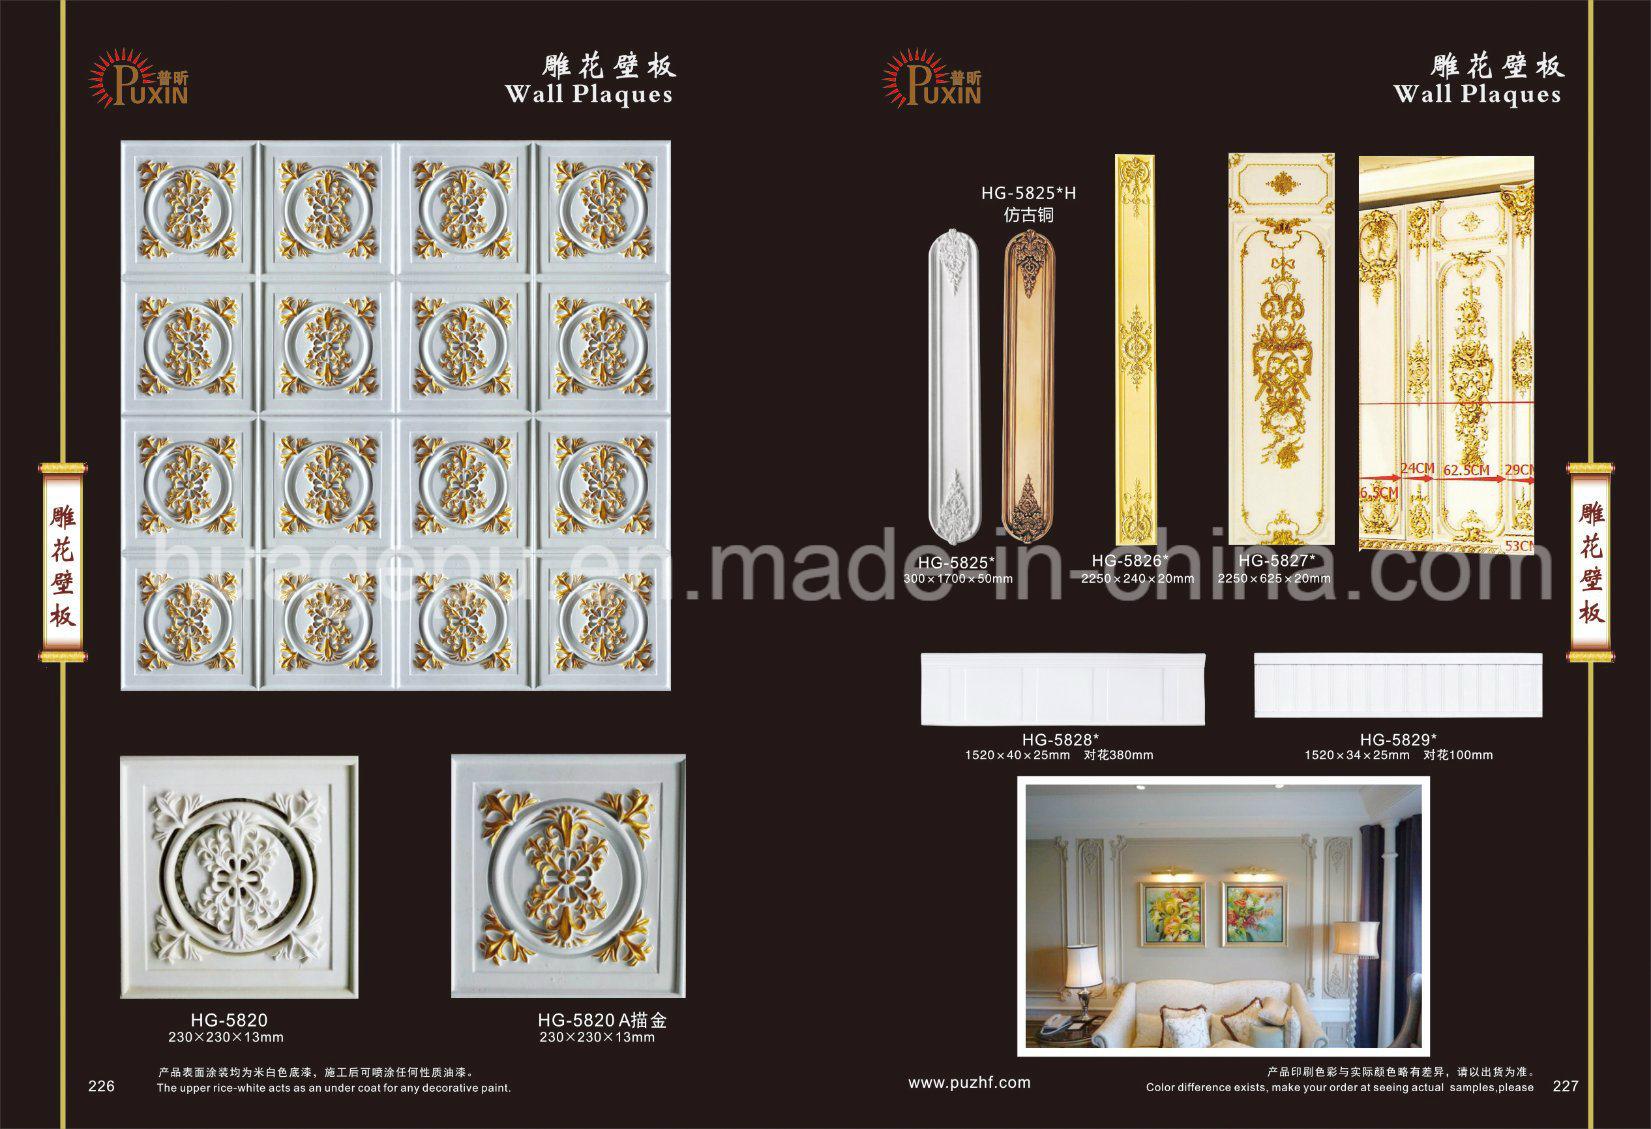 Artistic Polyurethane Wall Plaques for Interior Decoration